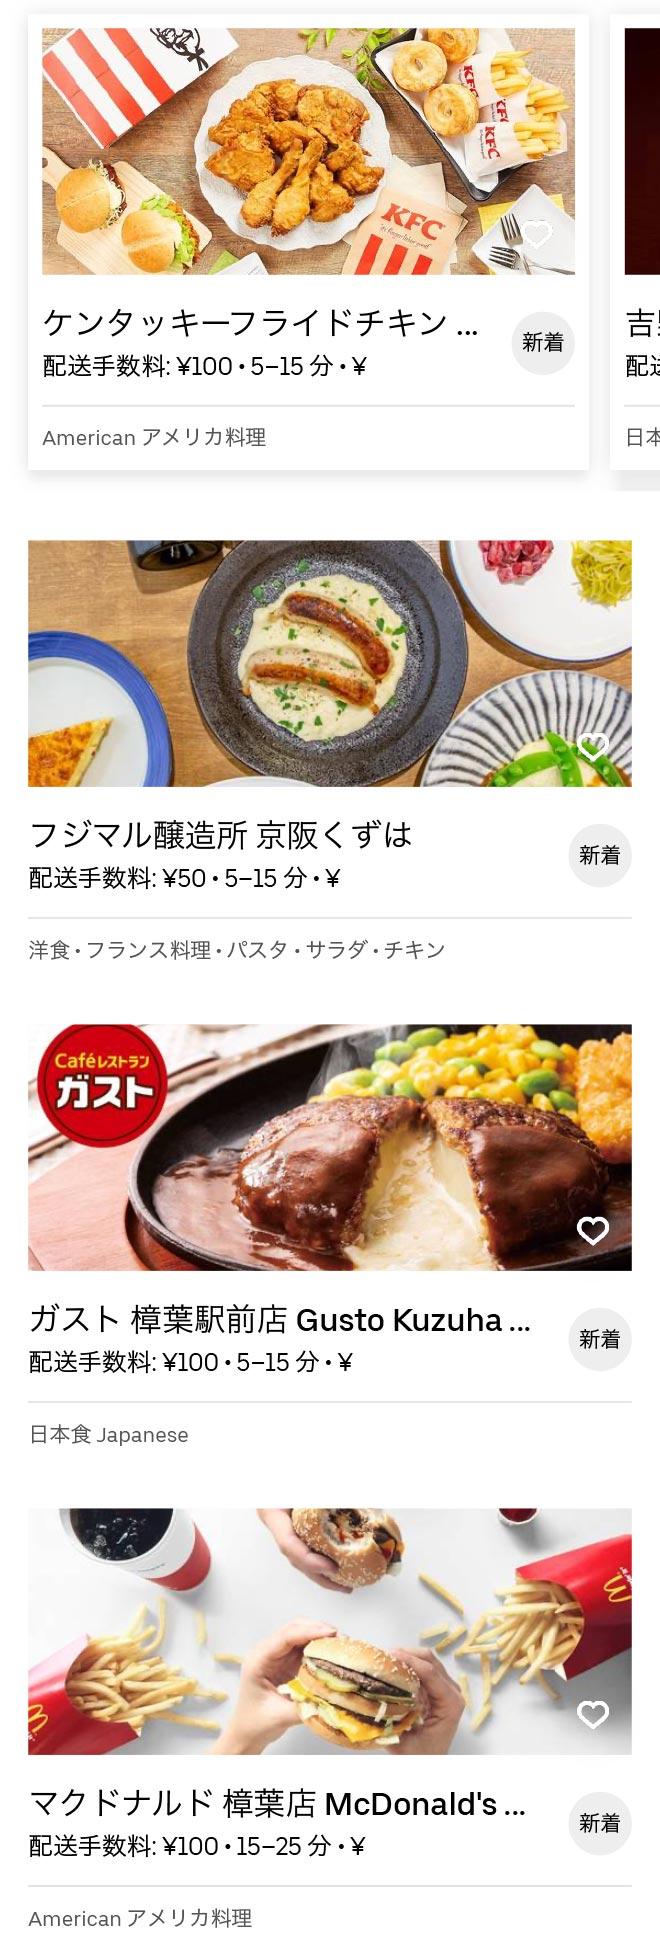 Hirakata kuzuha menu 2005 01